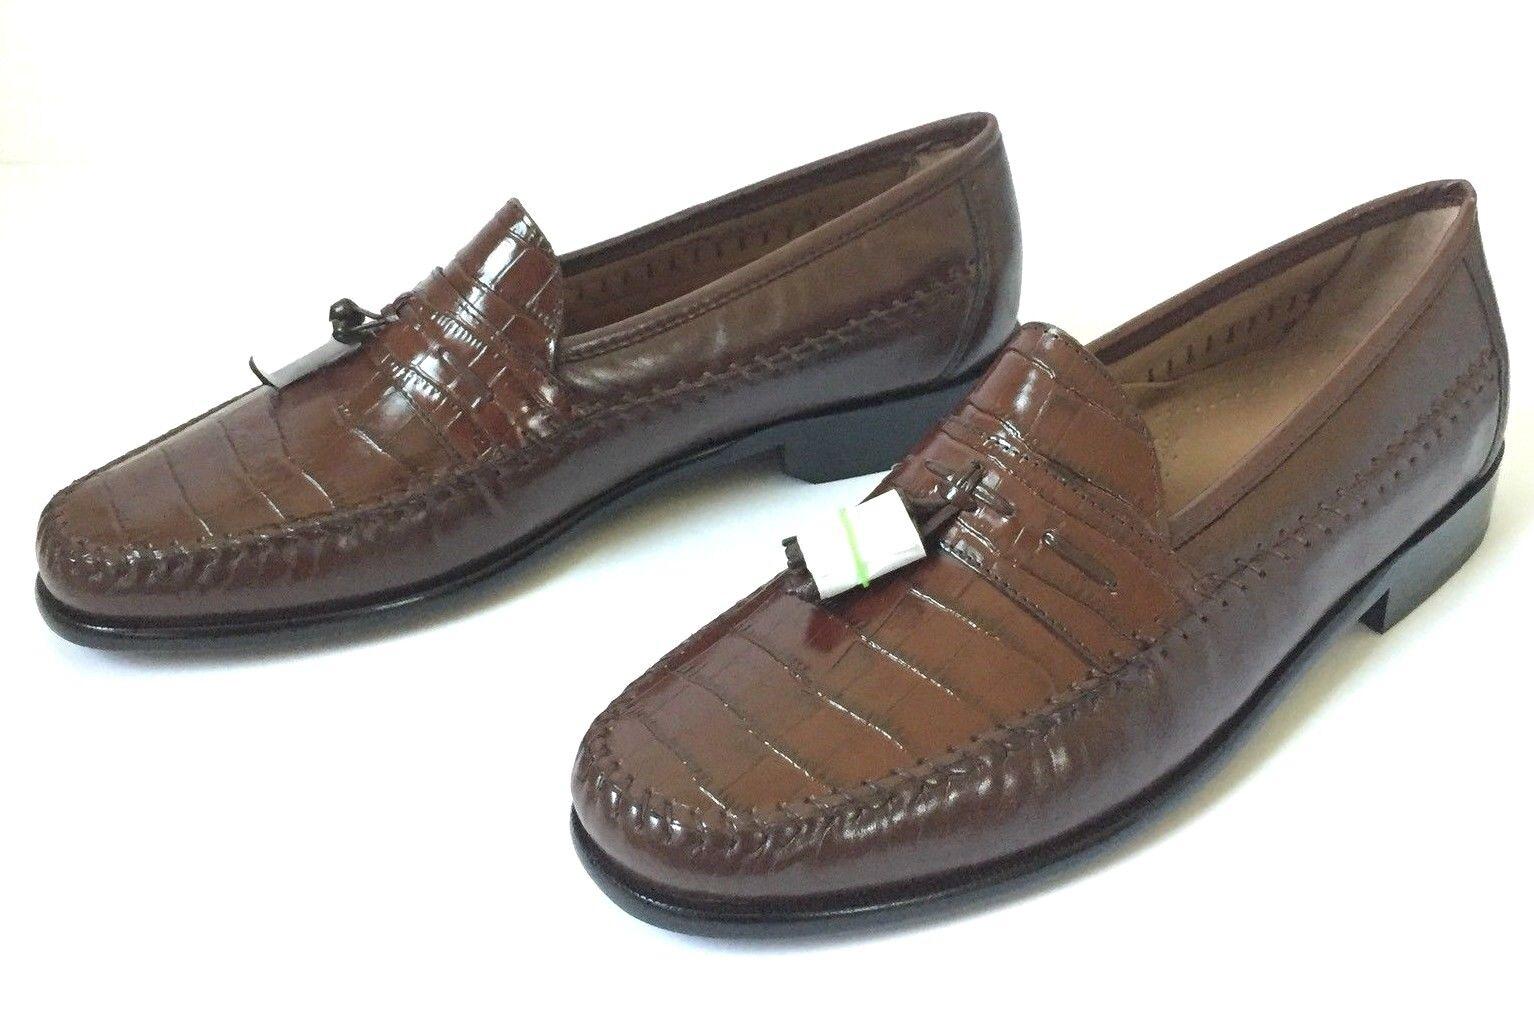 Florsheim Pisa Leather Croc Embossed Tassel Loafers - Men's Größe 11D - Cognac